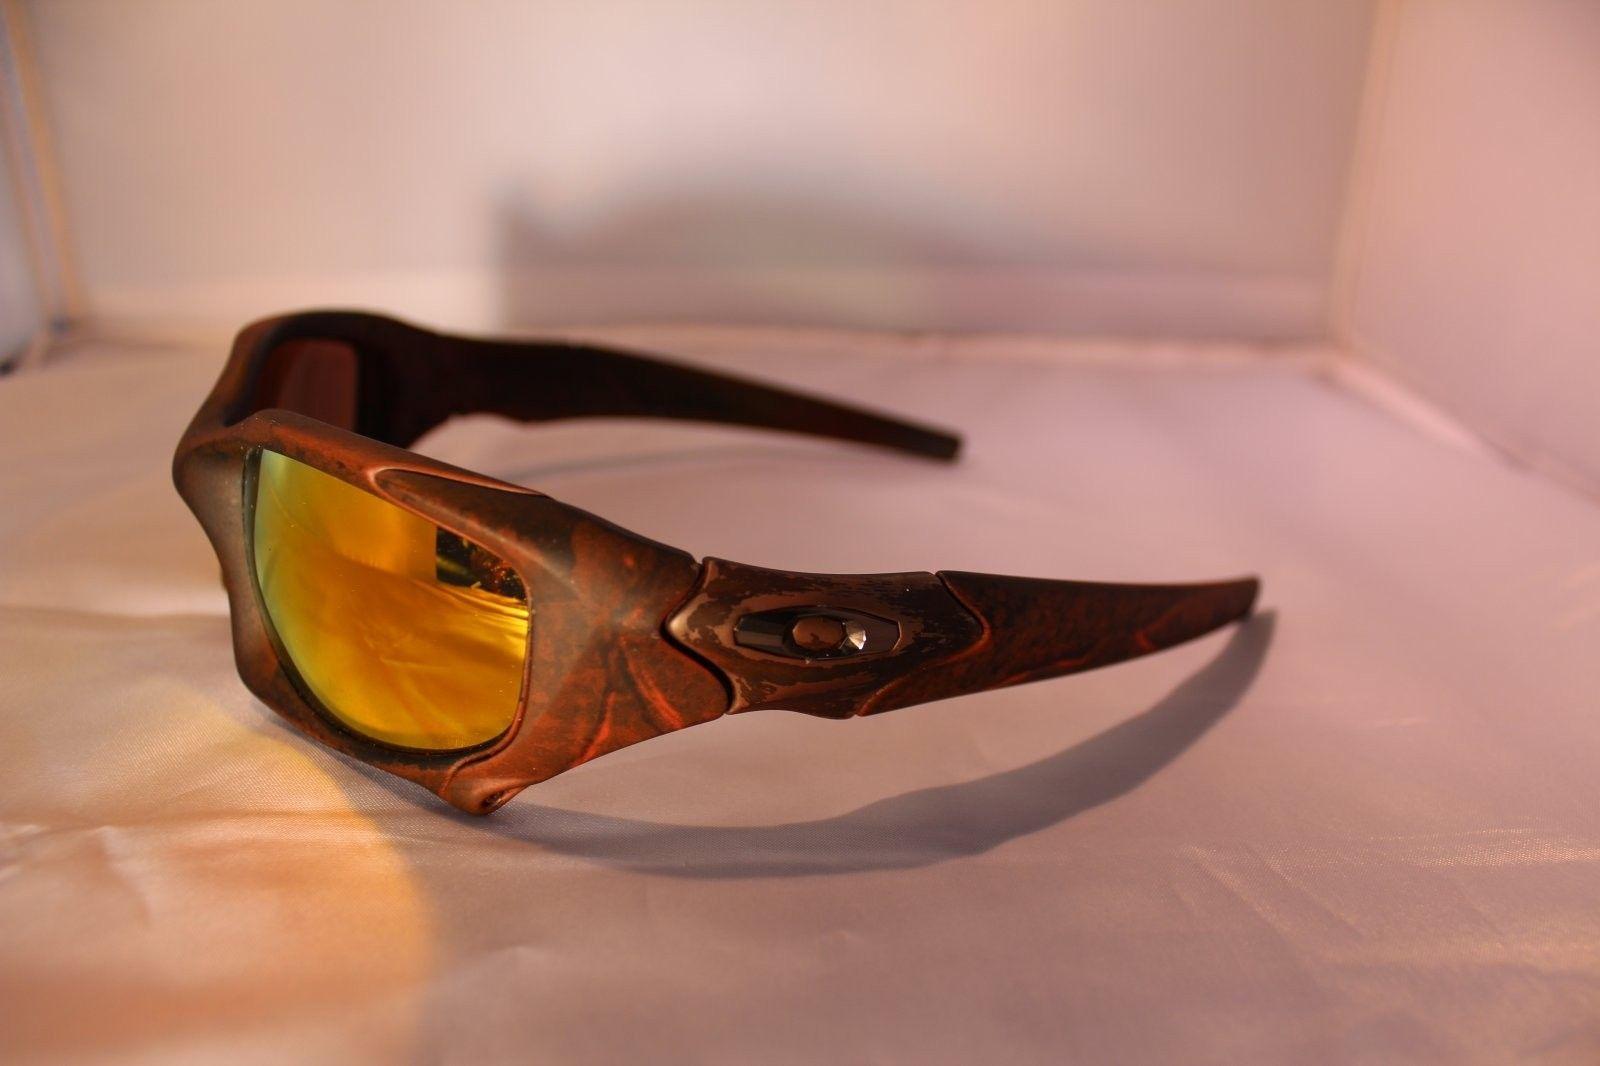 Custom Magma/Decay Pit Boss 1, Dr Chop Dirty Dog, Rust Face Off - oakley pics 10-24-14 (16).JPG